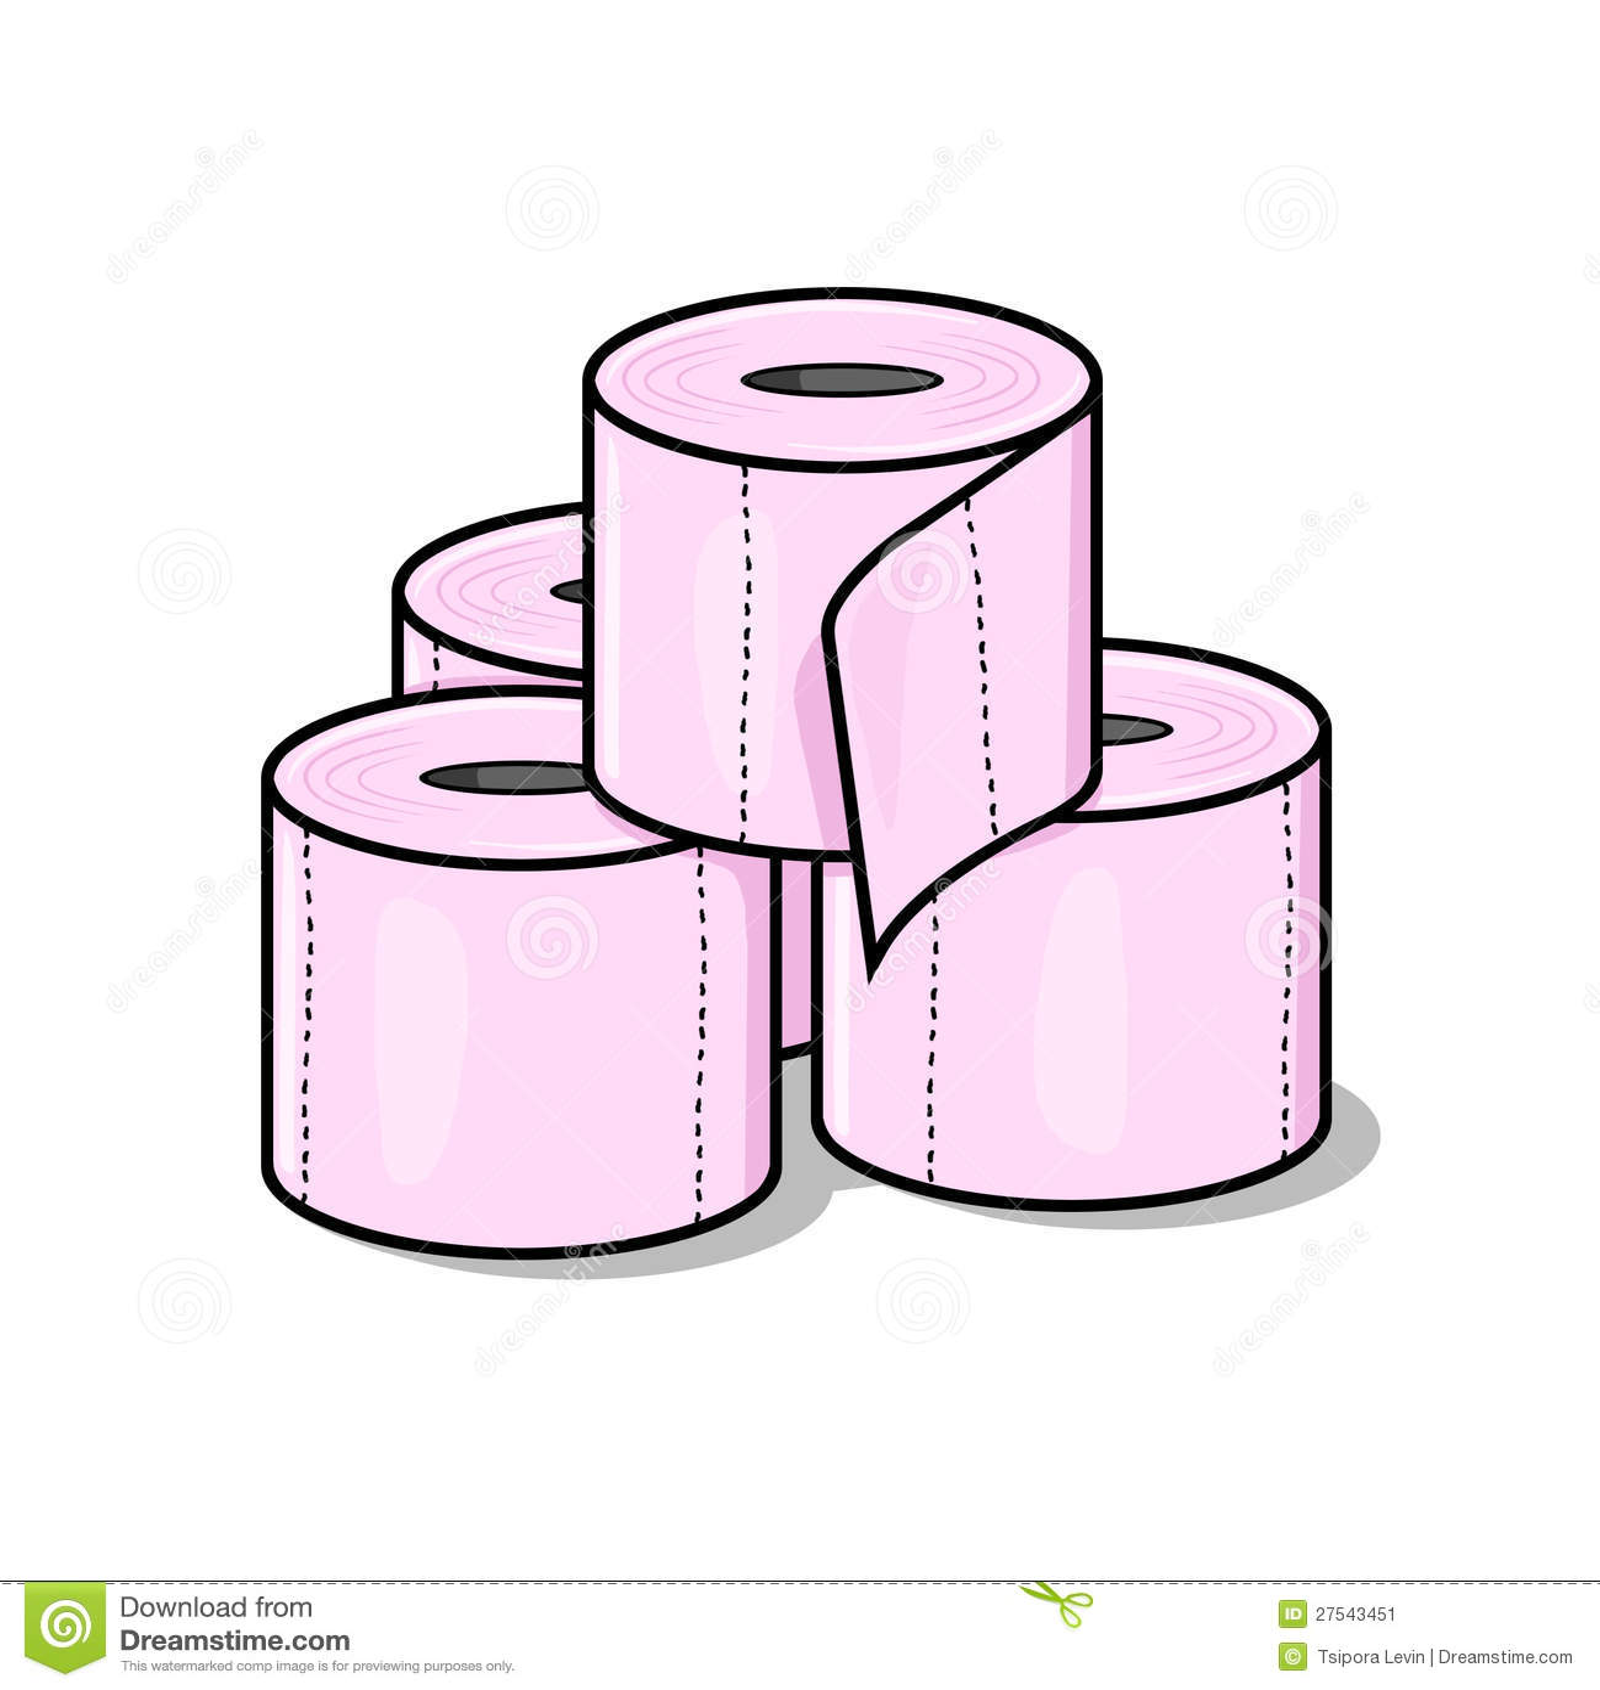 Toilet tissue clipart